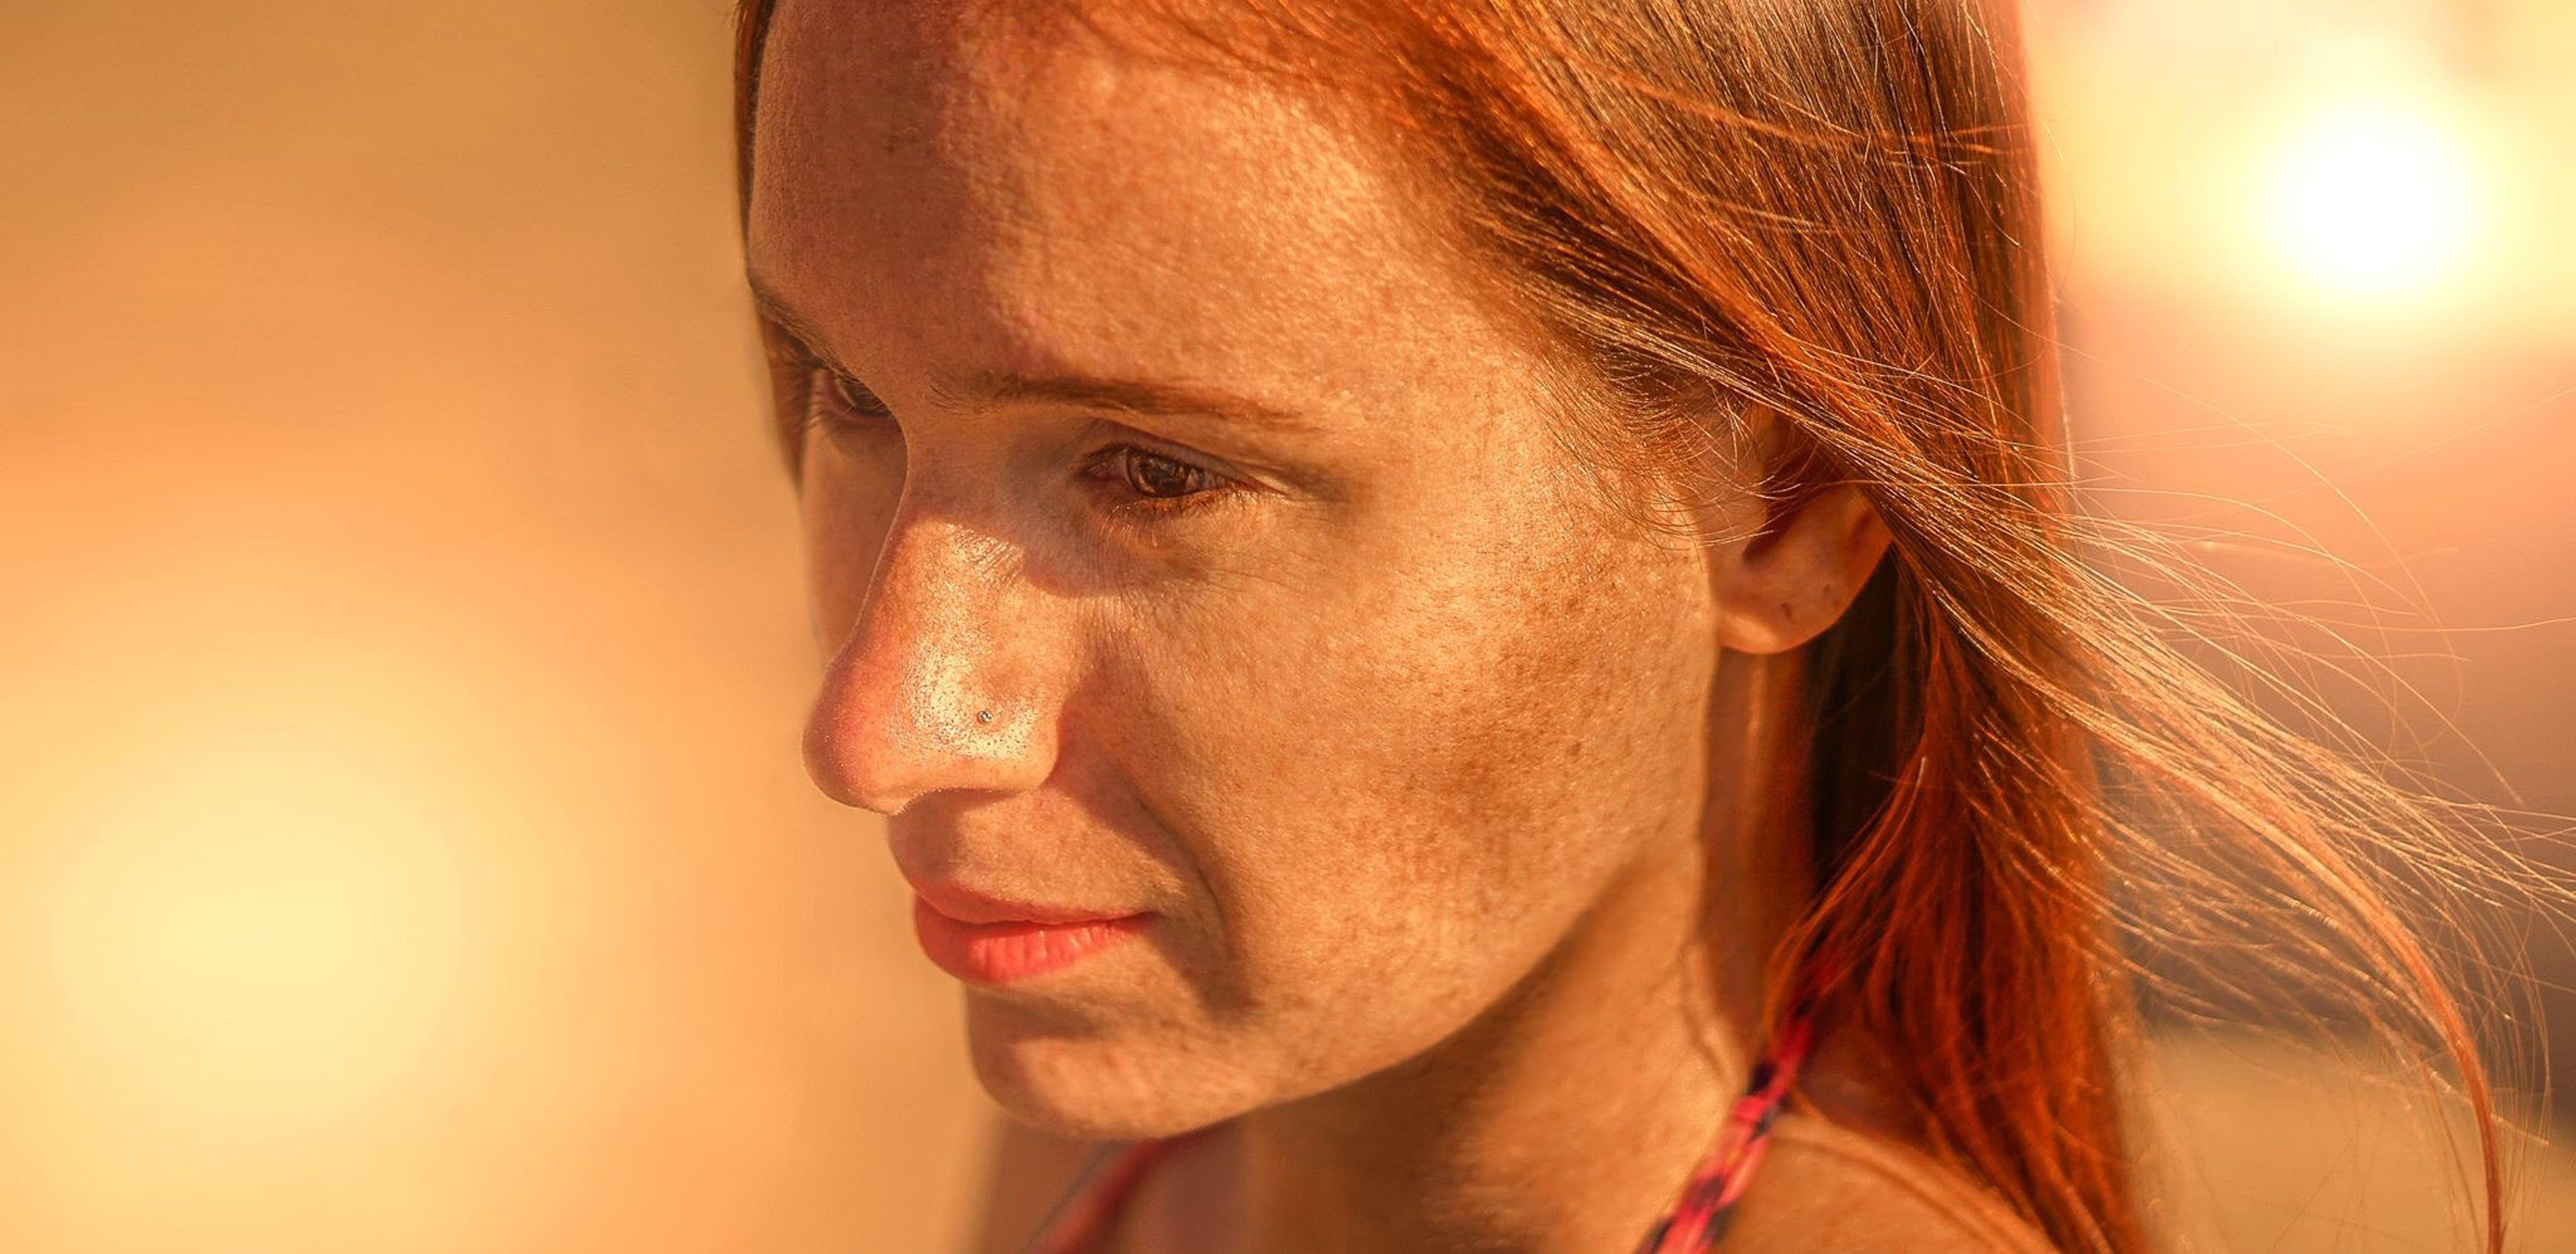 Kostenloses Stock Foto zu freckles, ingwer, orange, orange farbe